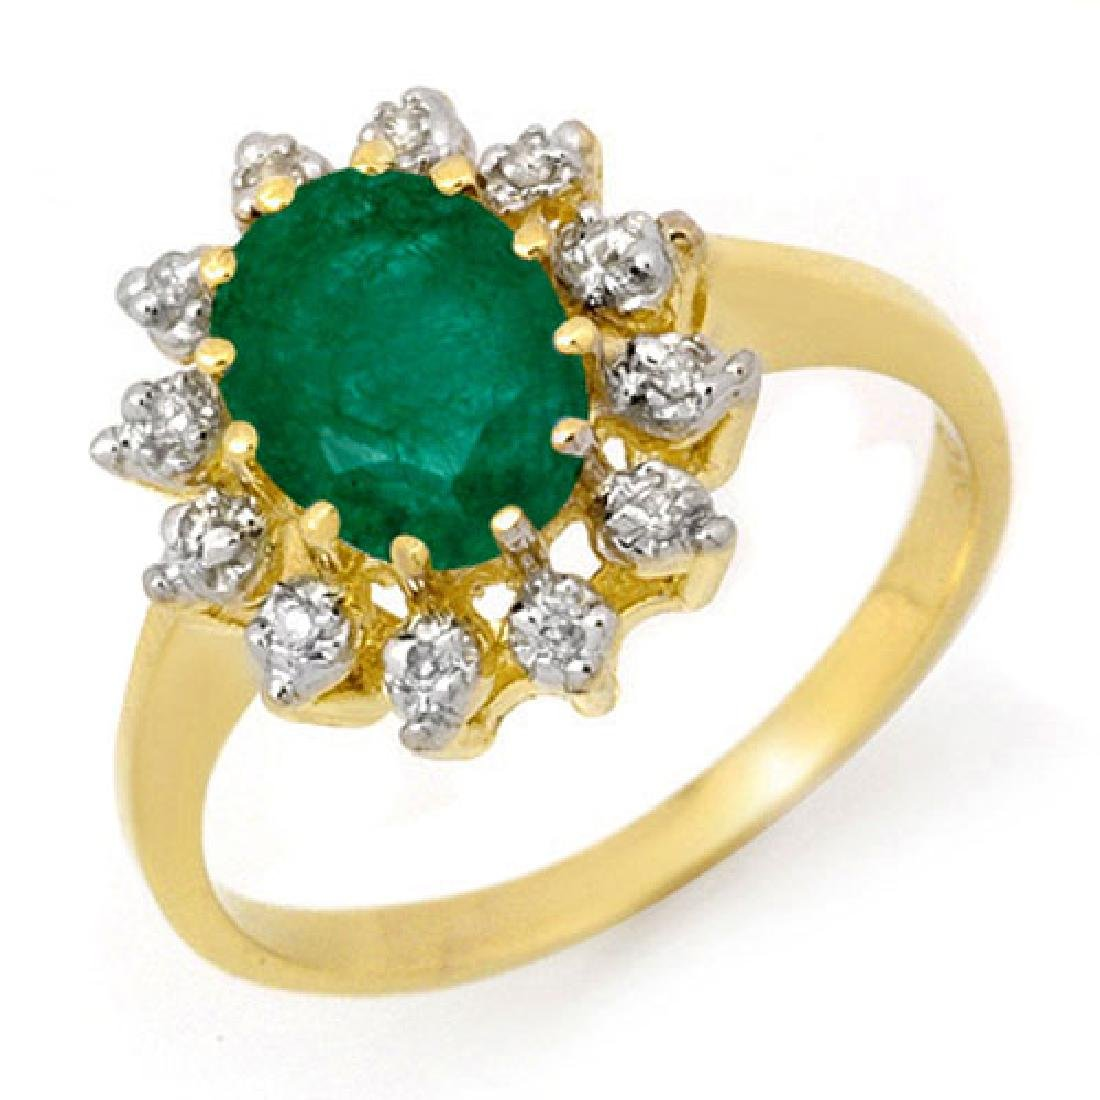 1.46 CTW Emerald & Diamond Ring 10K Yellow Gold